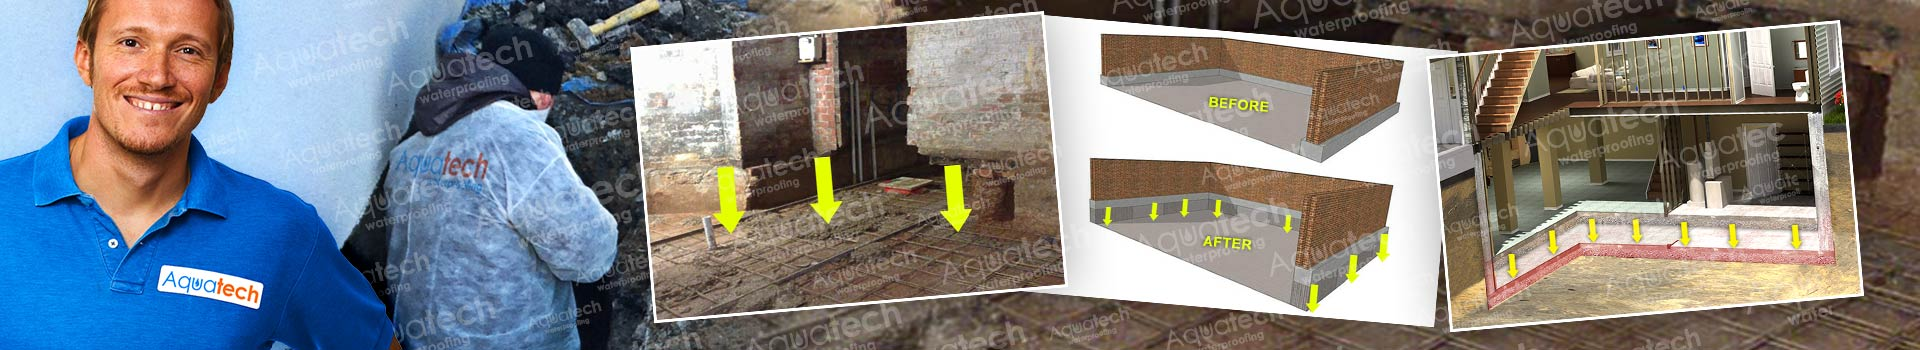 aquatech-basement-lowering-your-basement